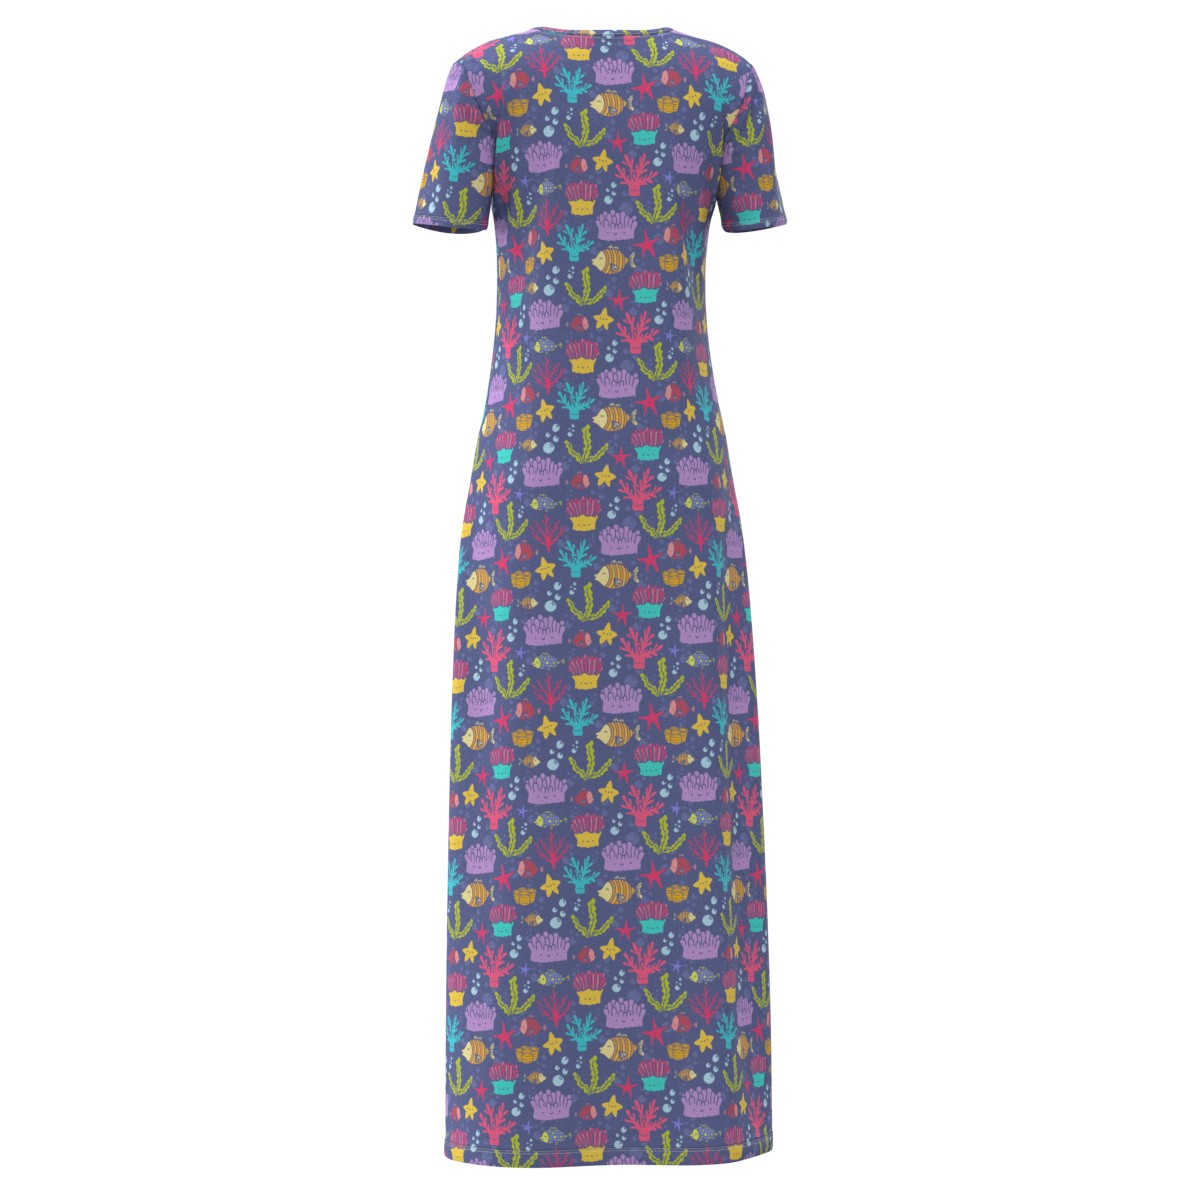 Coral Reefs Fishes Women Women Women Short Sleeve & Sleeveless Maxi Dress Size XS-5XL Plus 8680aa